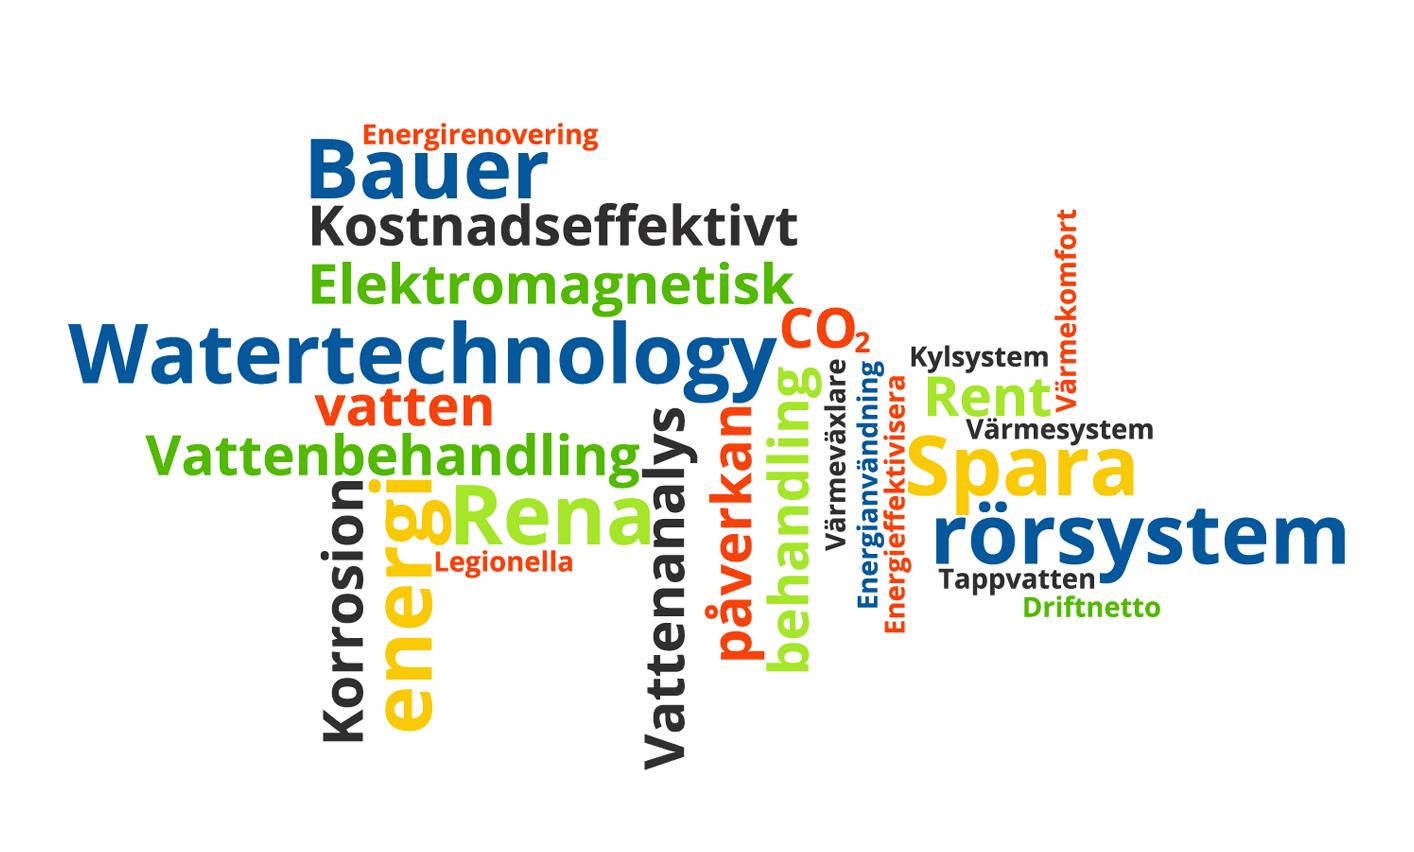 Bauer Watertechnology ordmoln